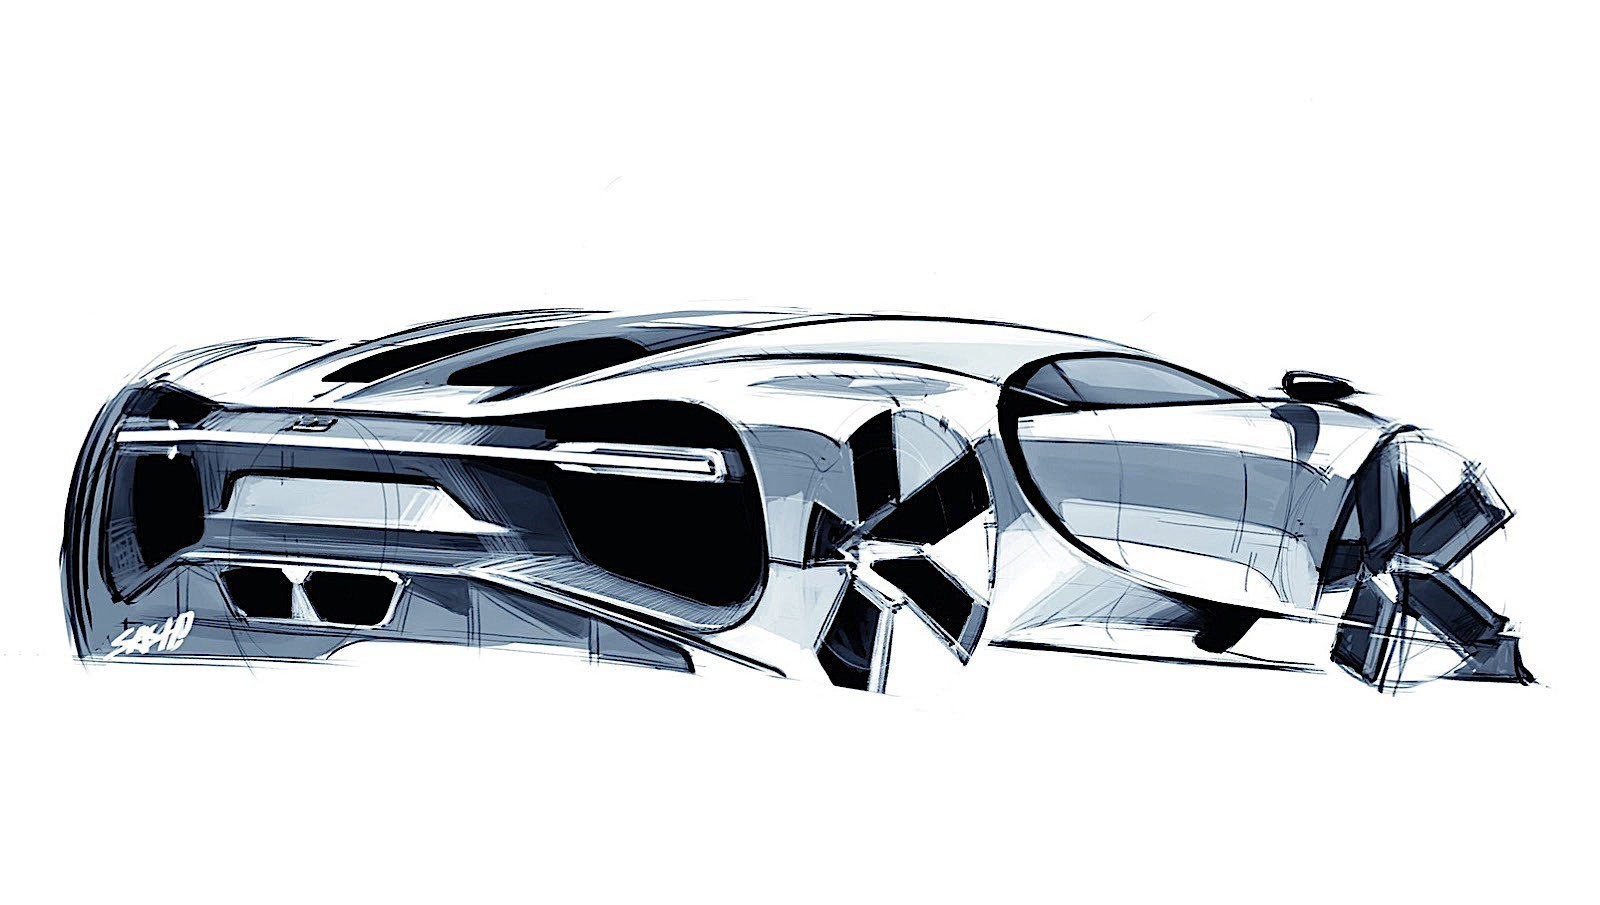 2017 Bugatti Chiron Lets Its Quad Turbocharged W16 Loose Autoevolution